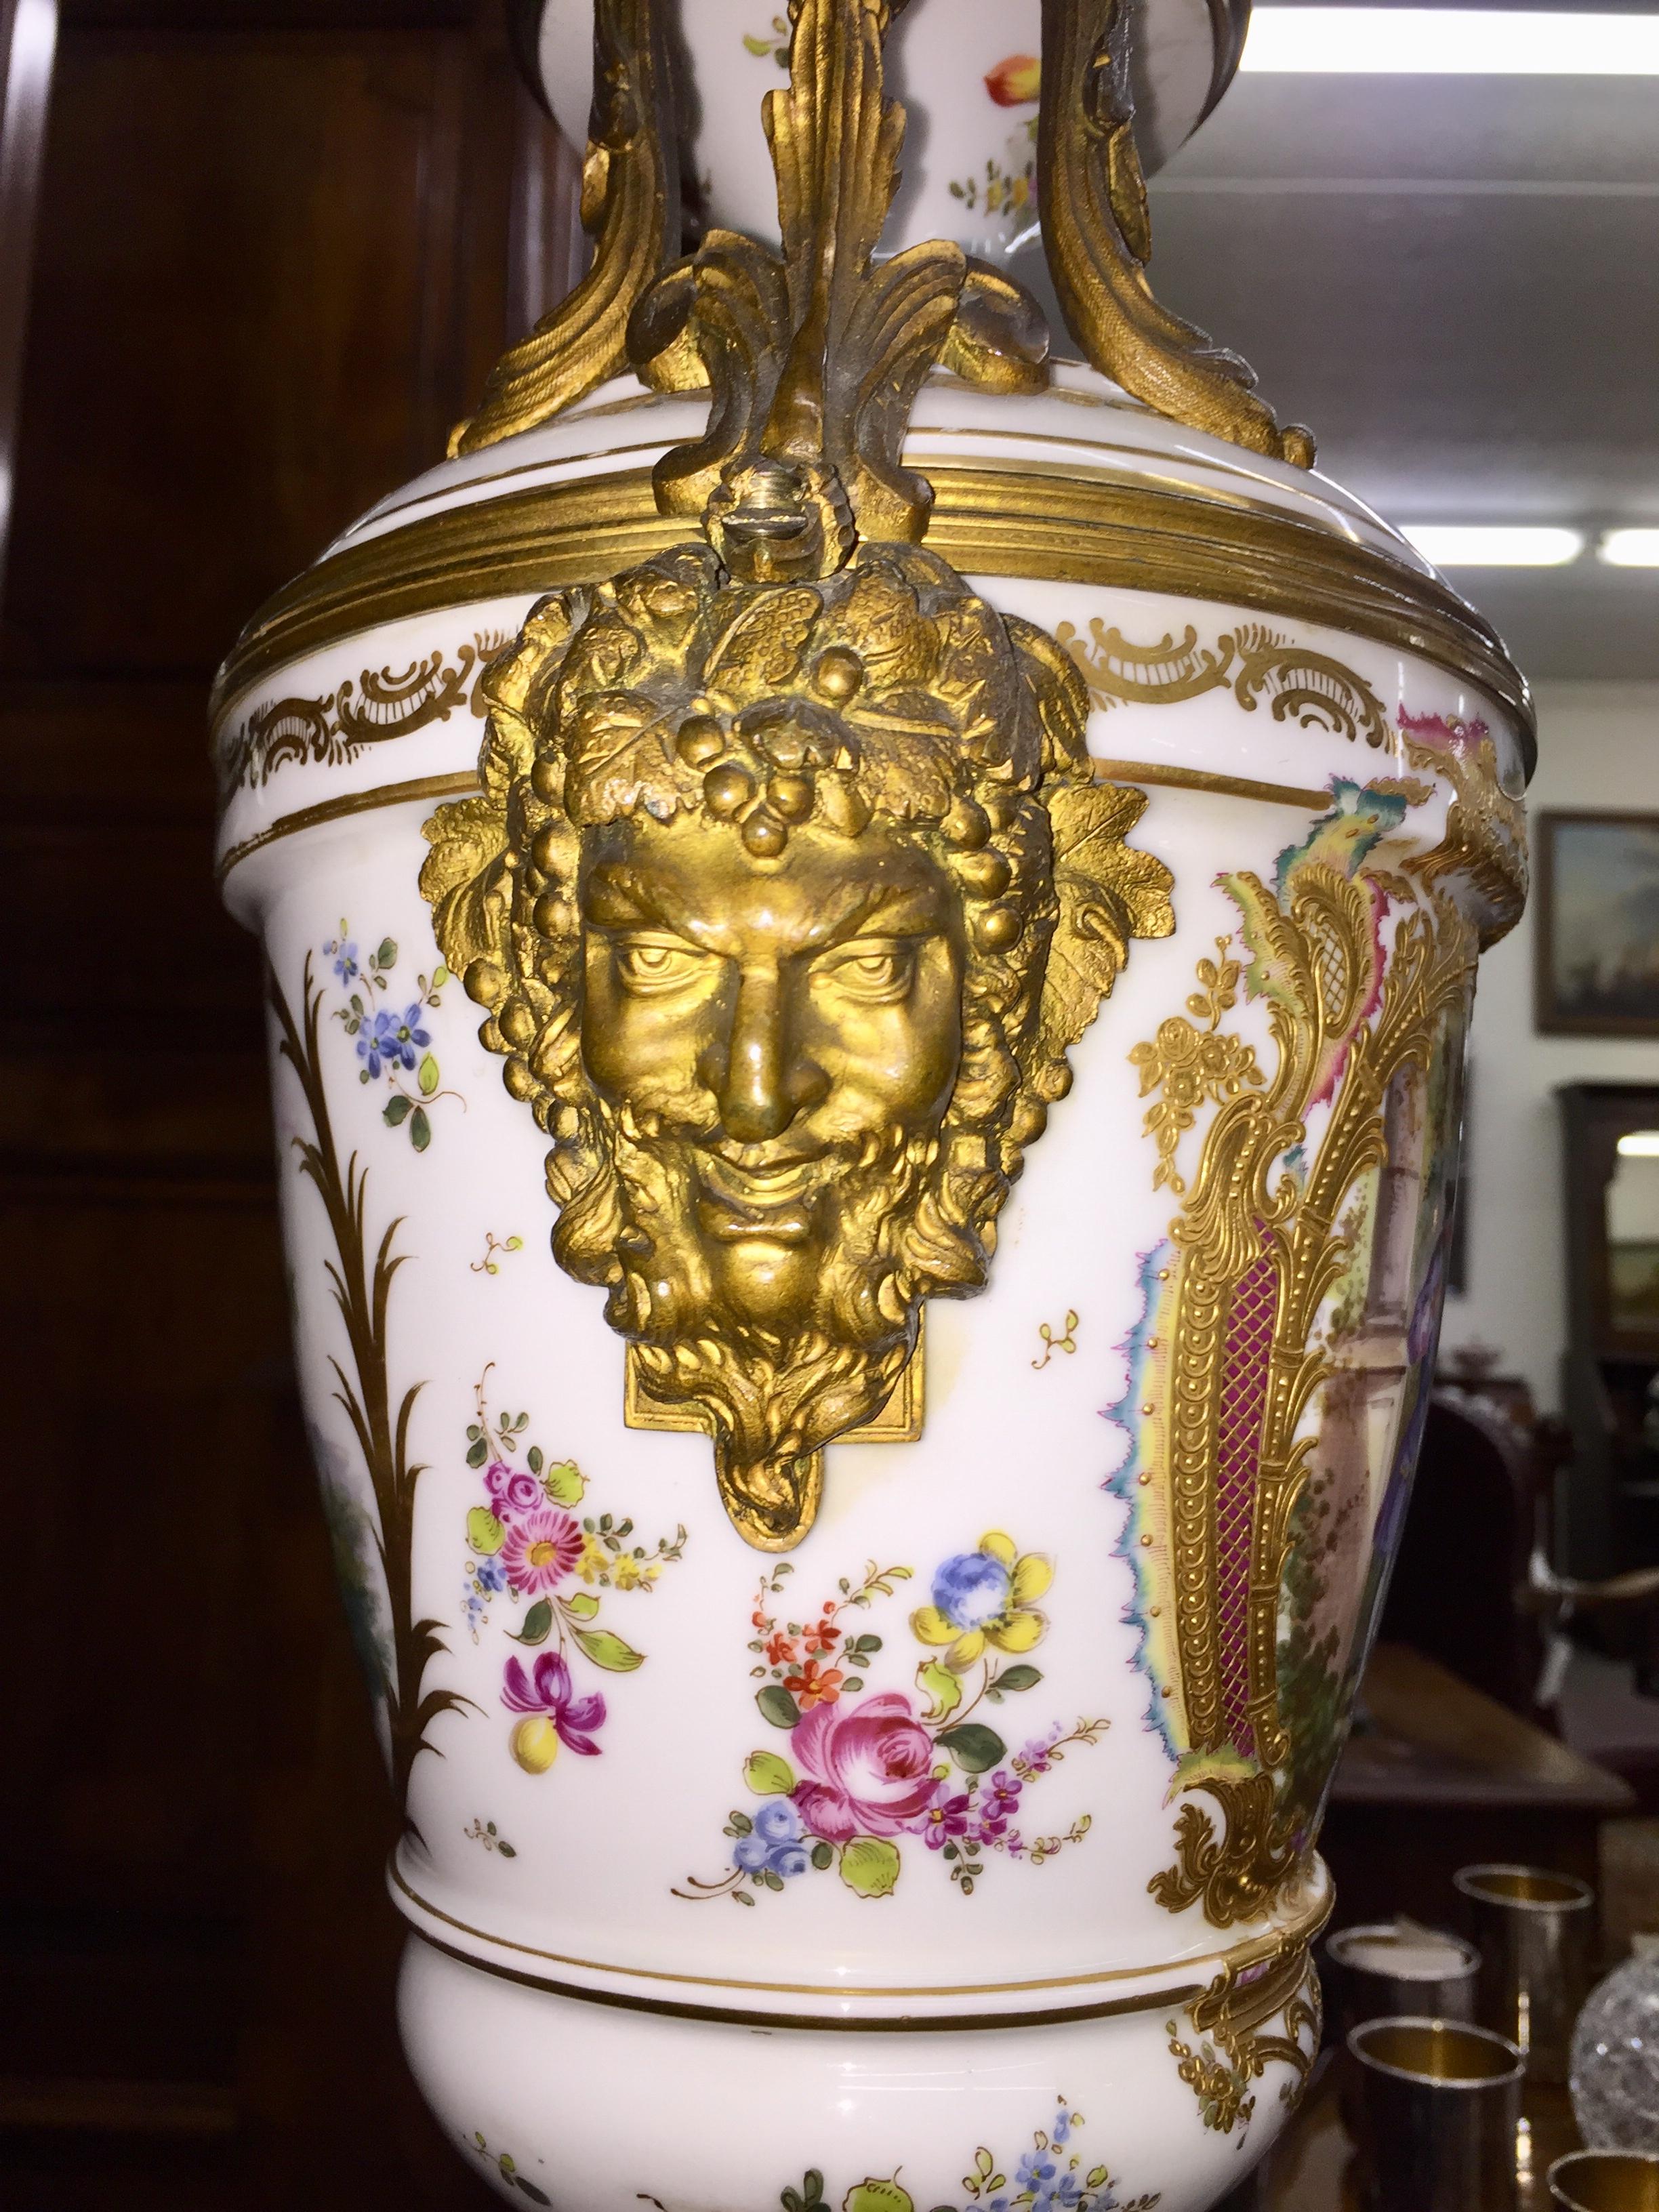 Sevrés Porcelain Capped Urn